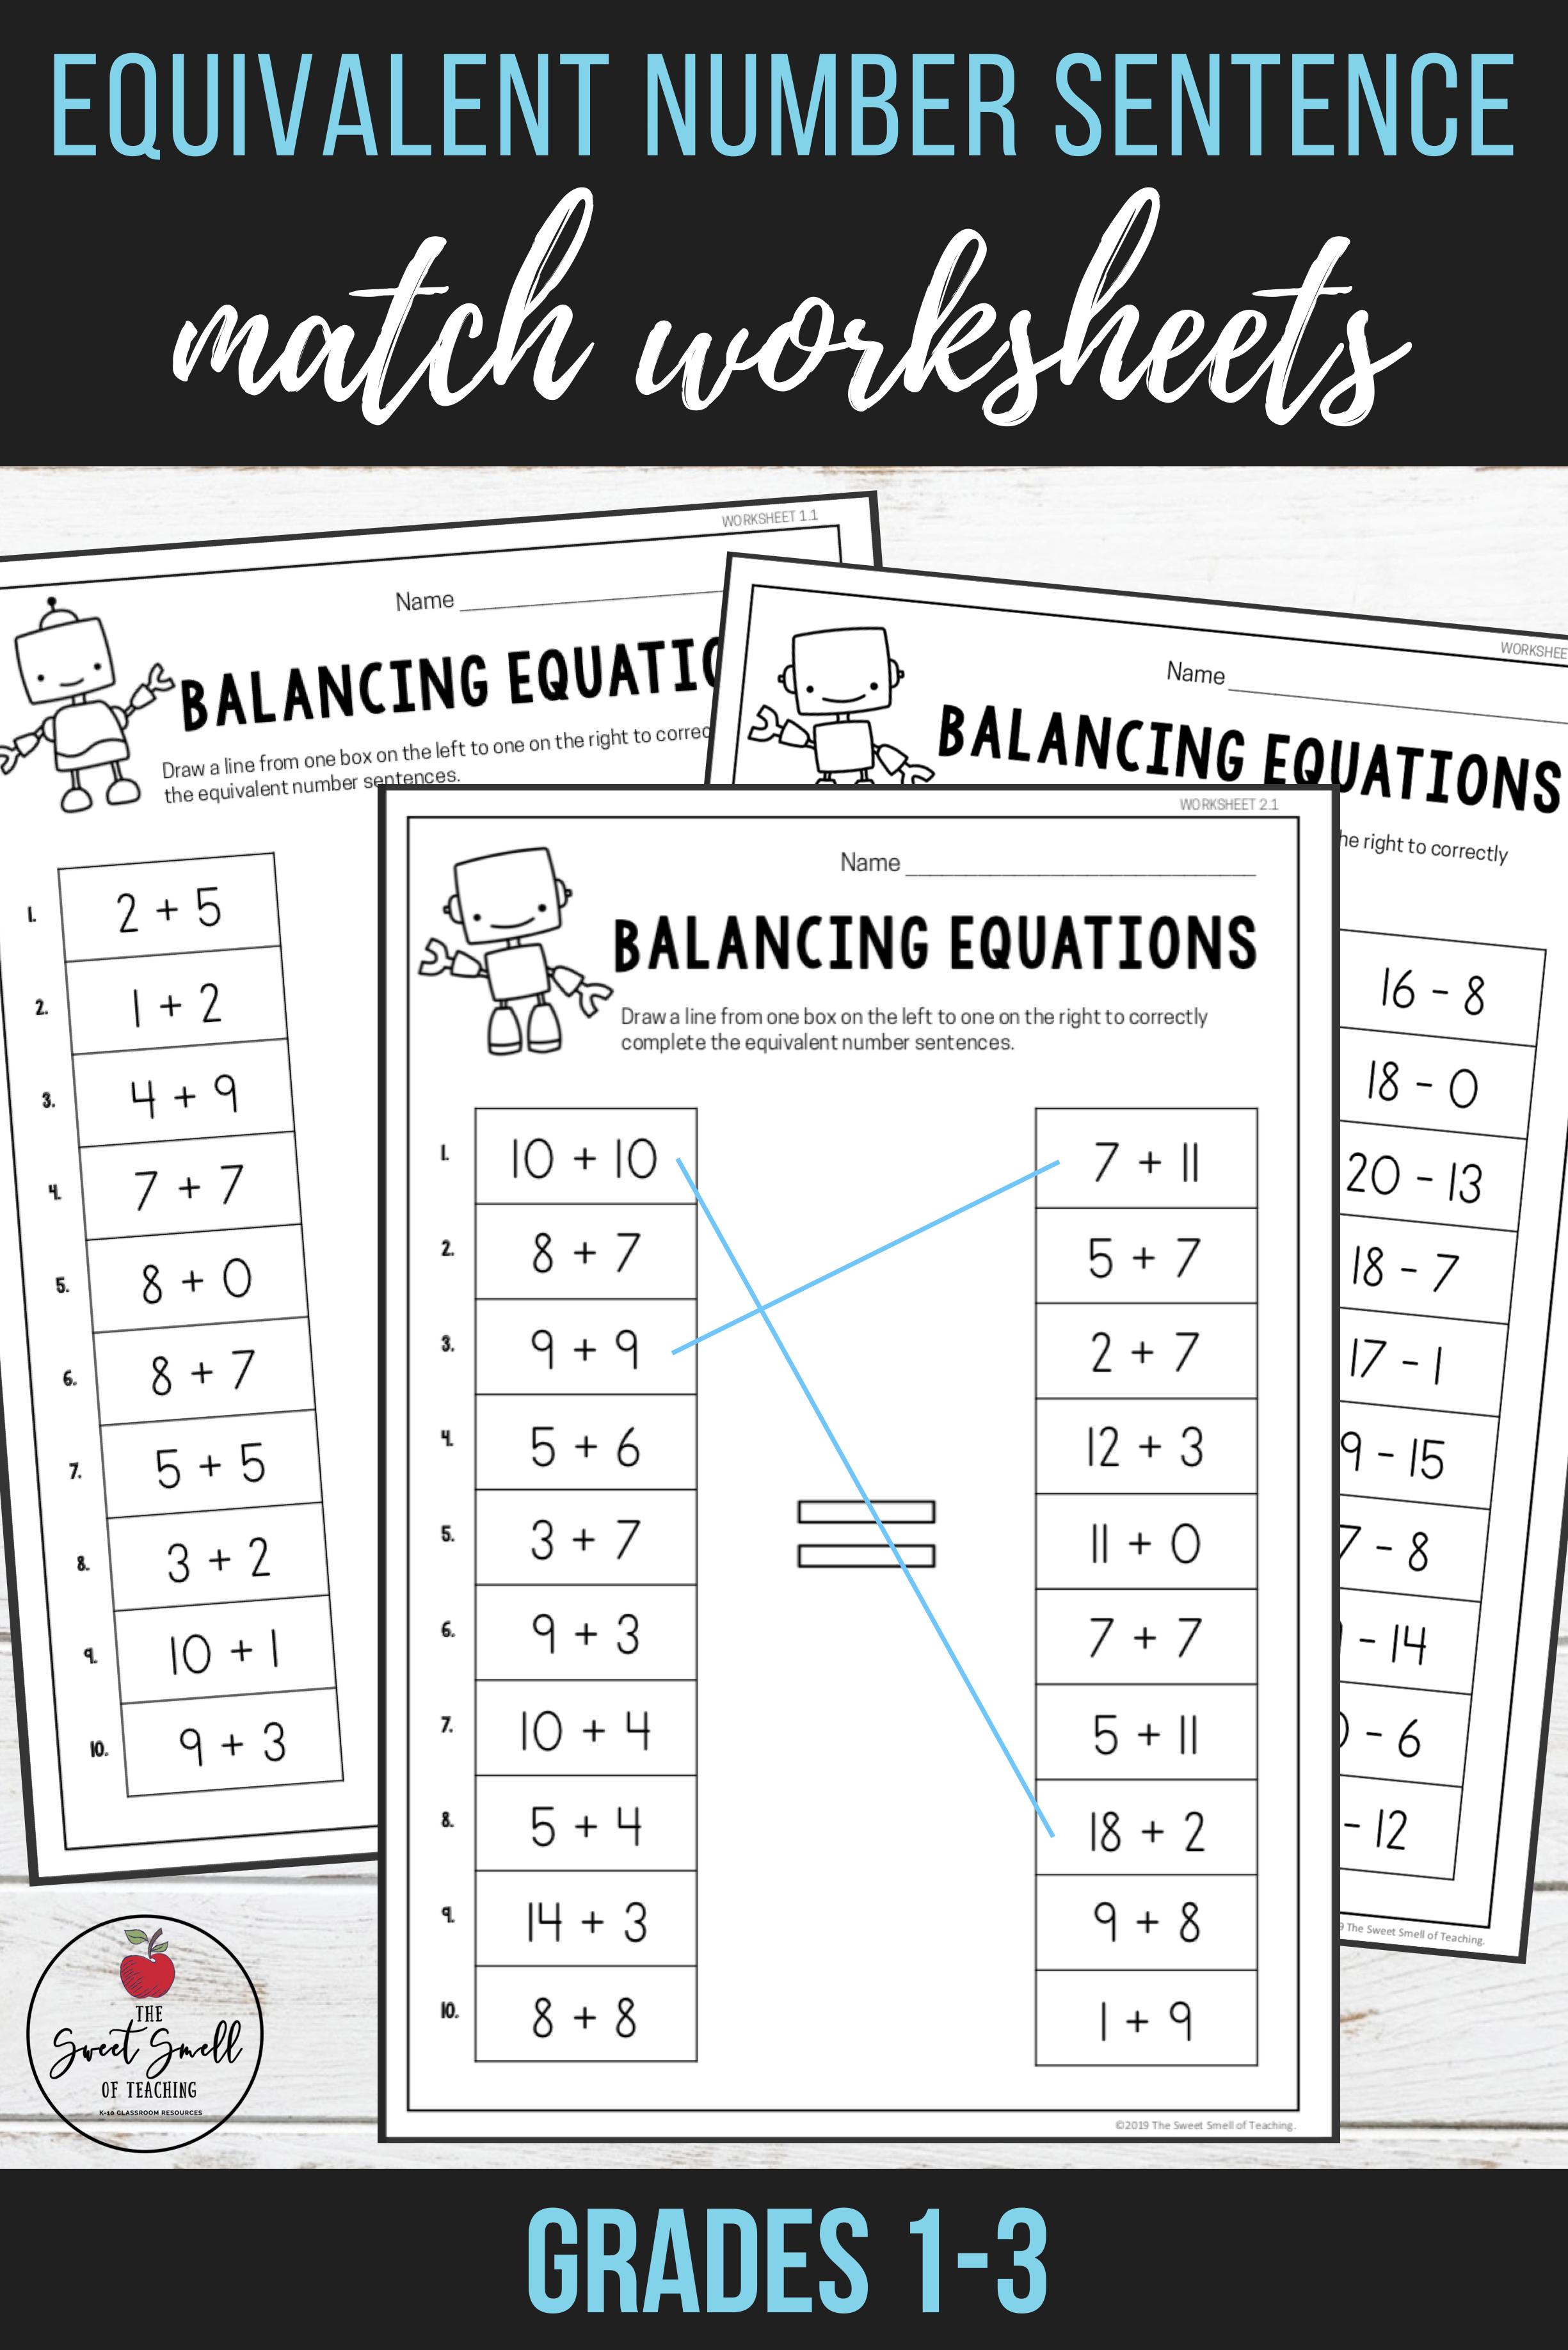 Balancing Equations Challenge Worksheet Answer Key